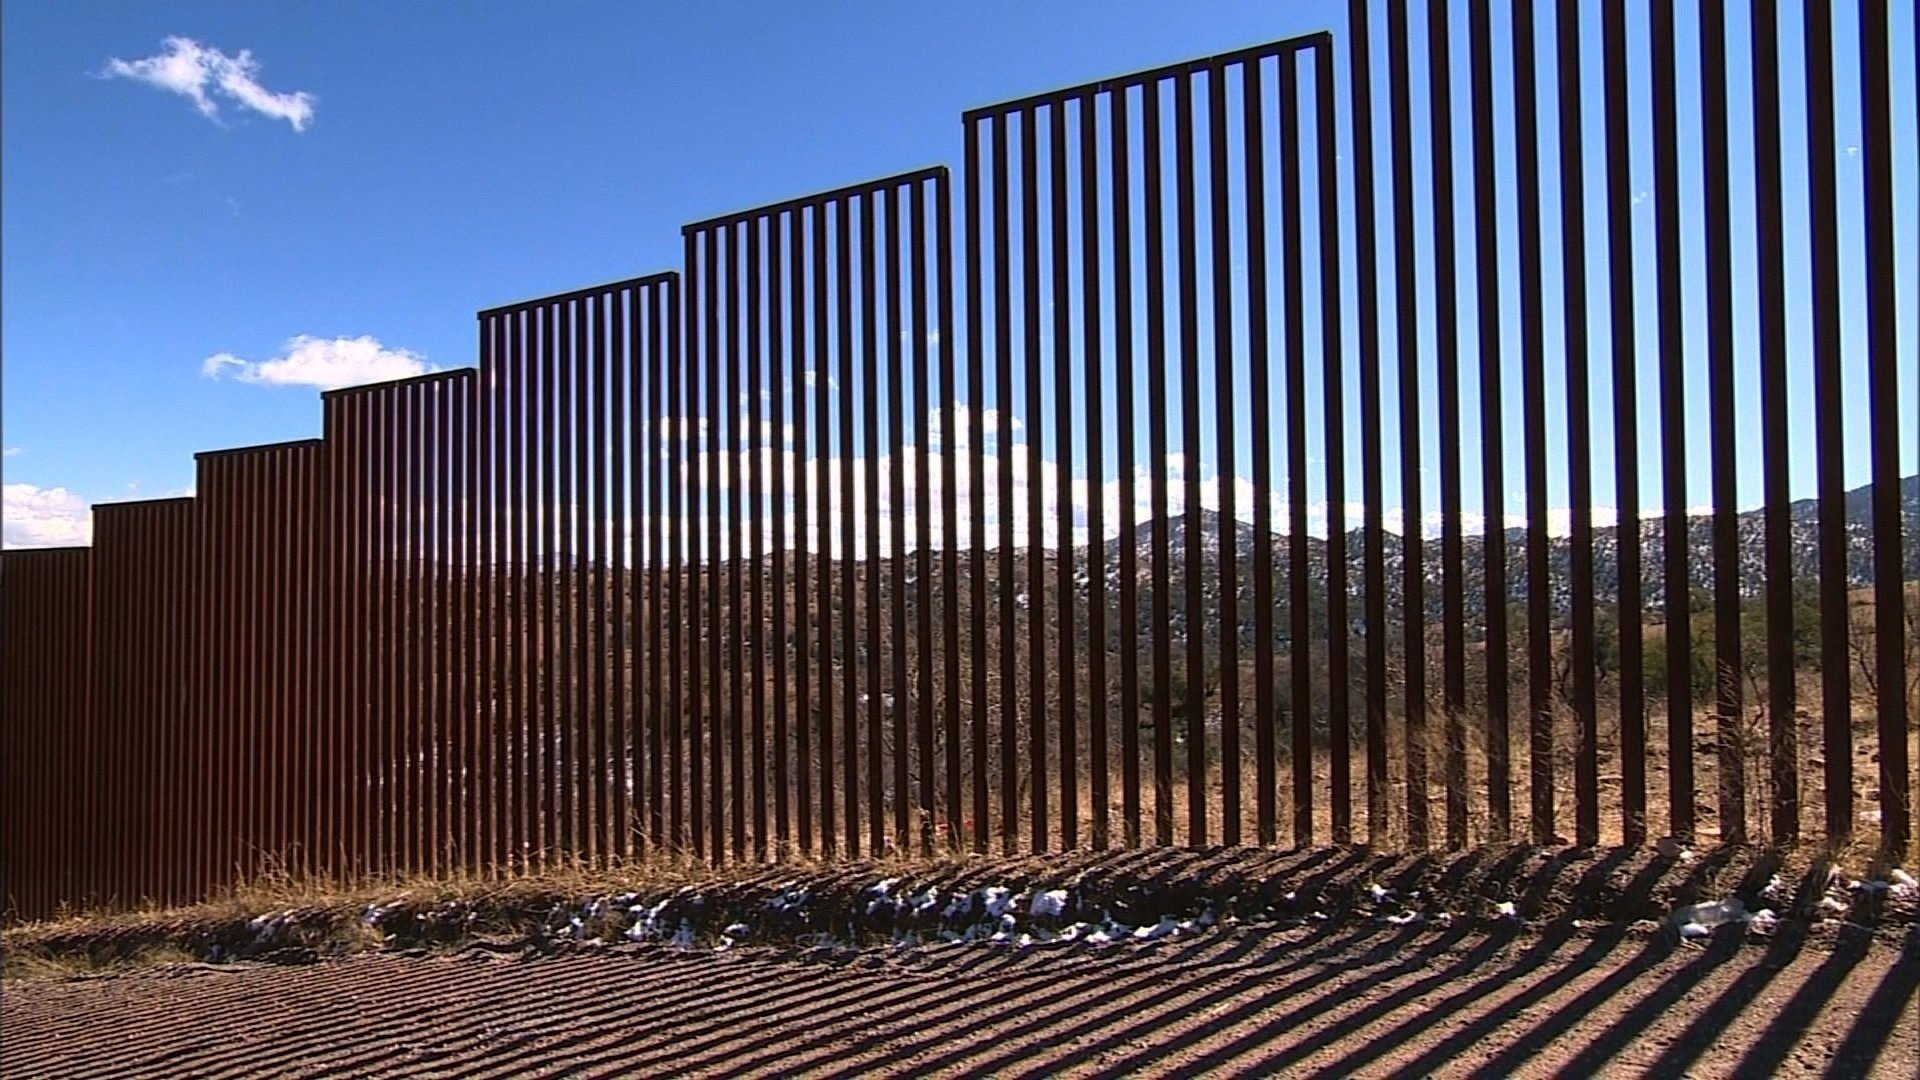 A section of the U.S-Mexico border fence separating Nogales, Arizona and Santa Cruz, Mexico. (File Photo)